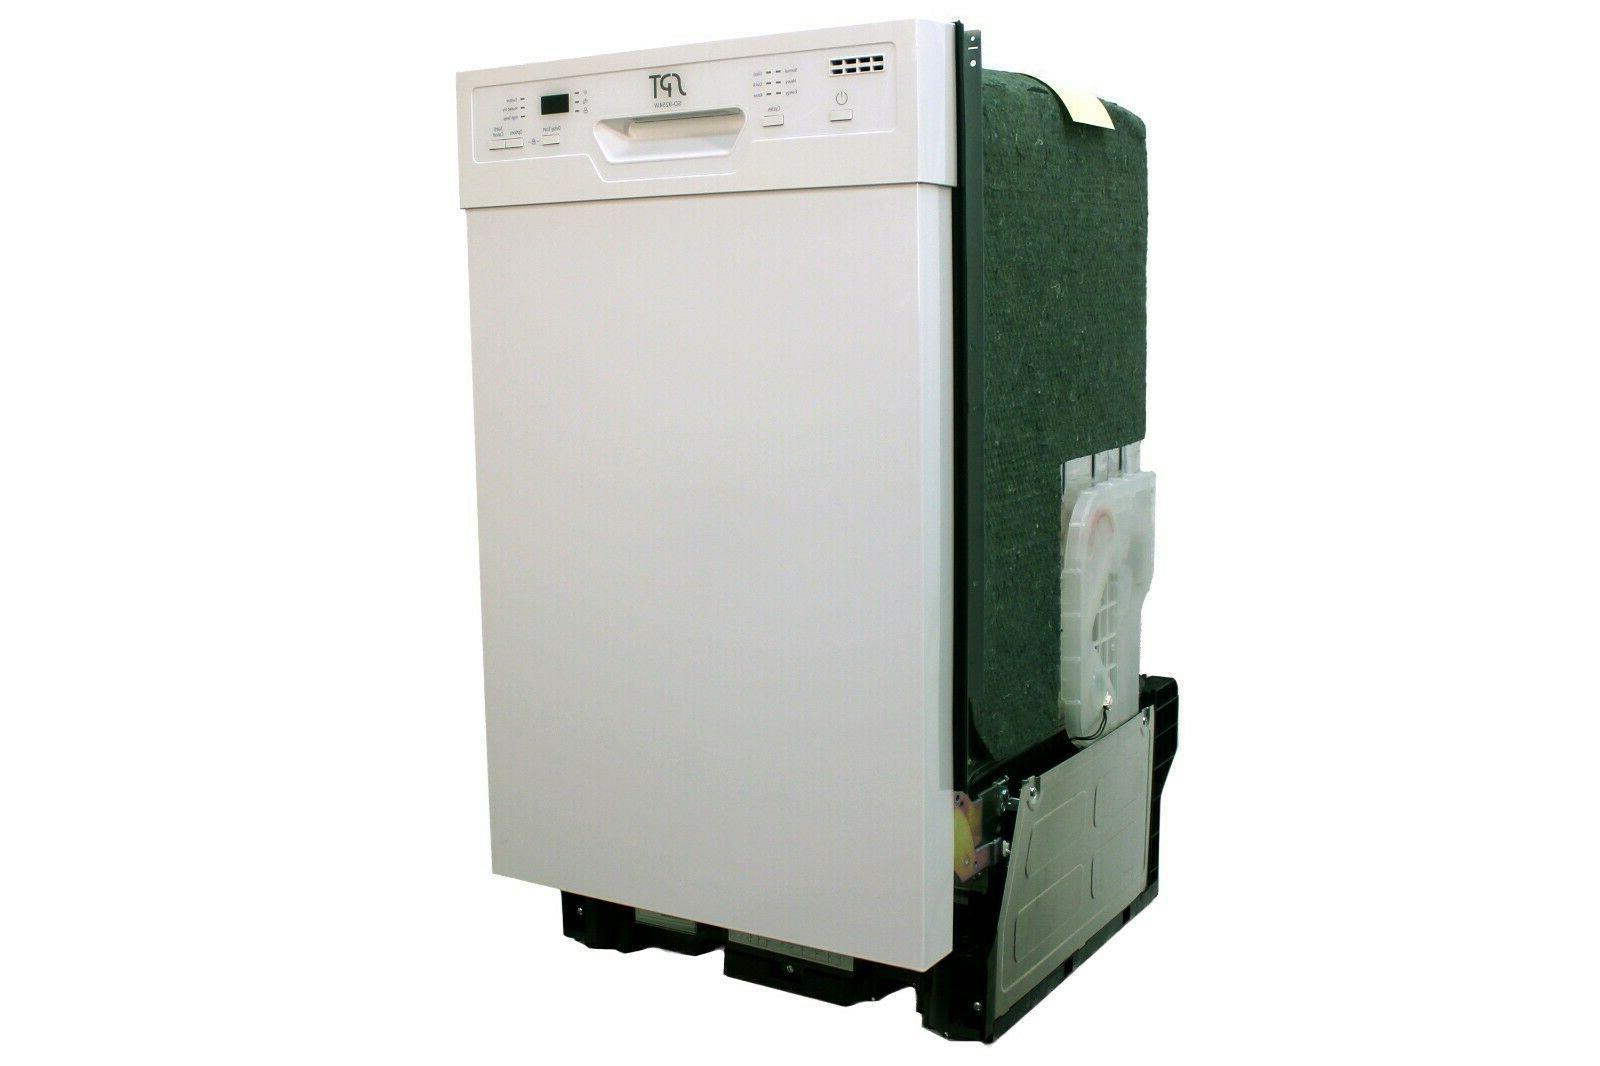 "Sunpentown 18"" Built-In Dishwasher w/Heating - White SD-9254W"